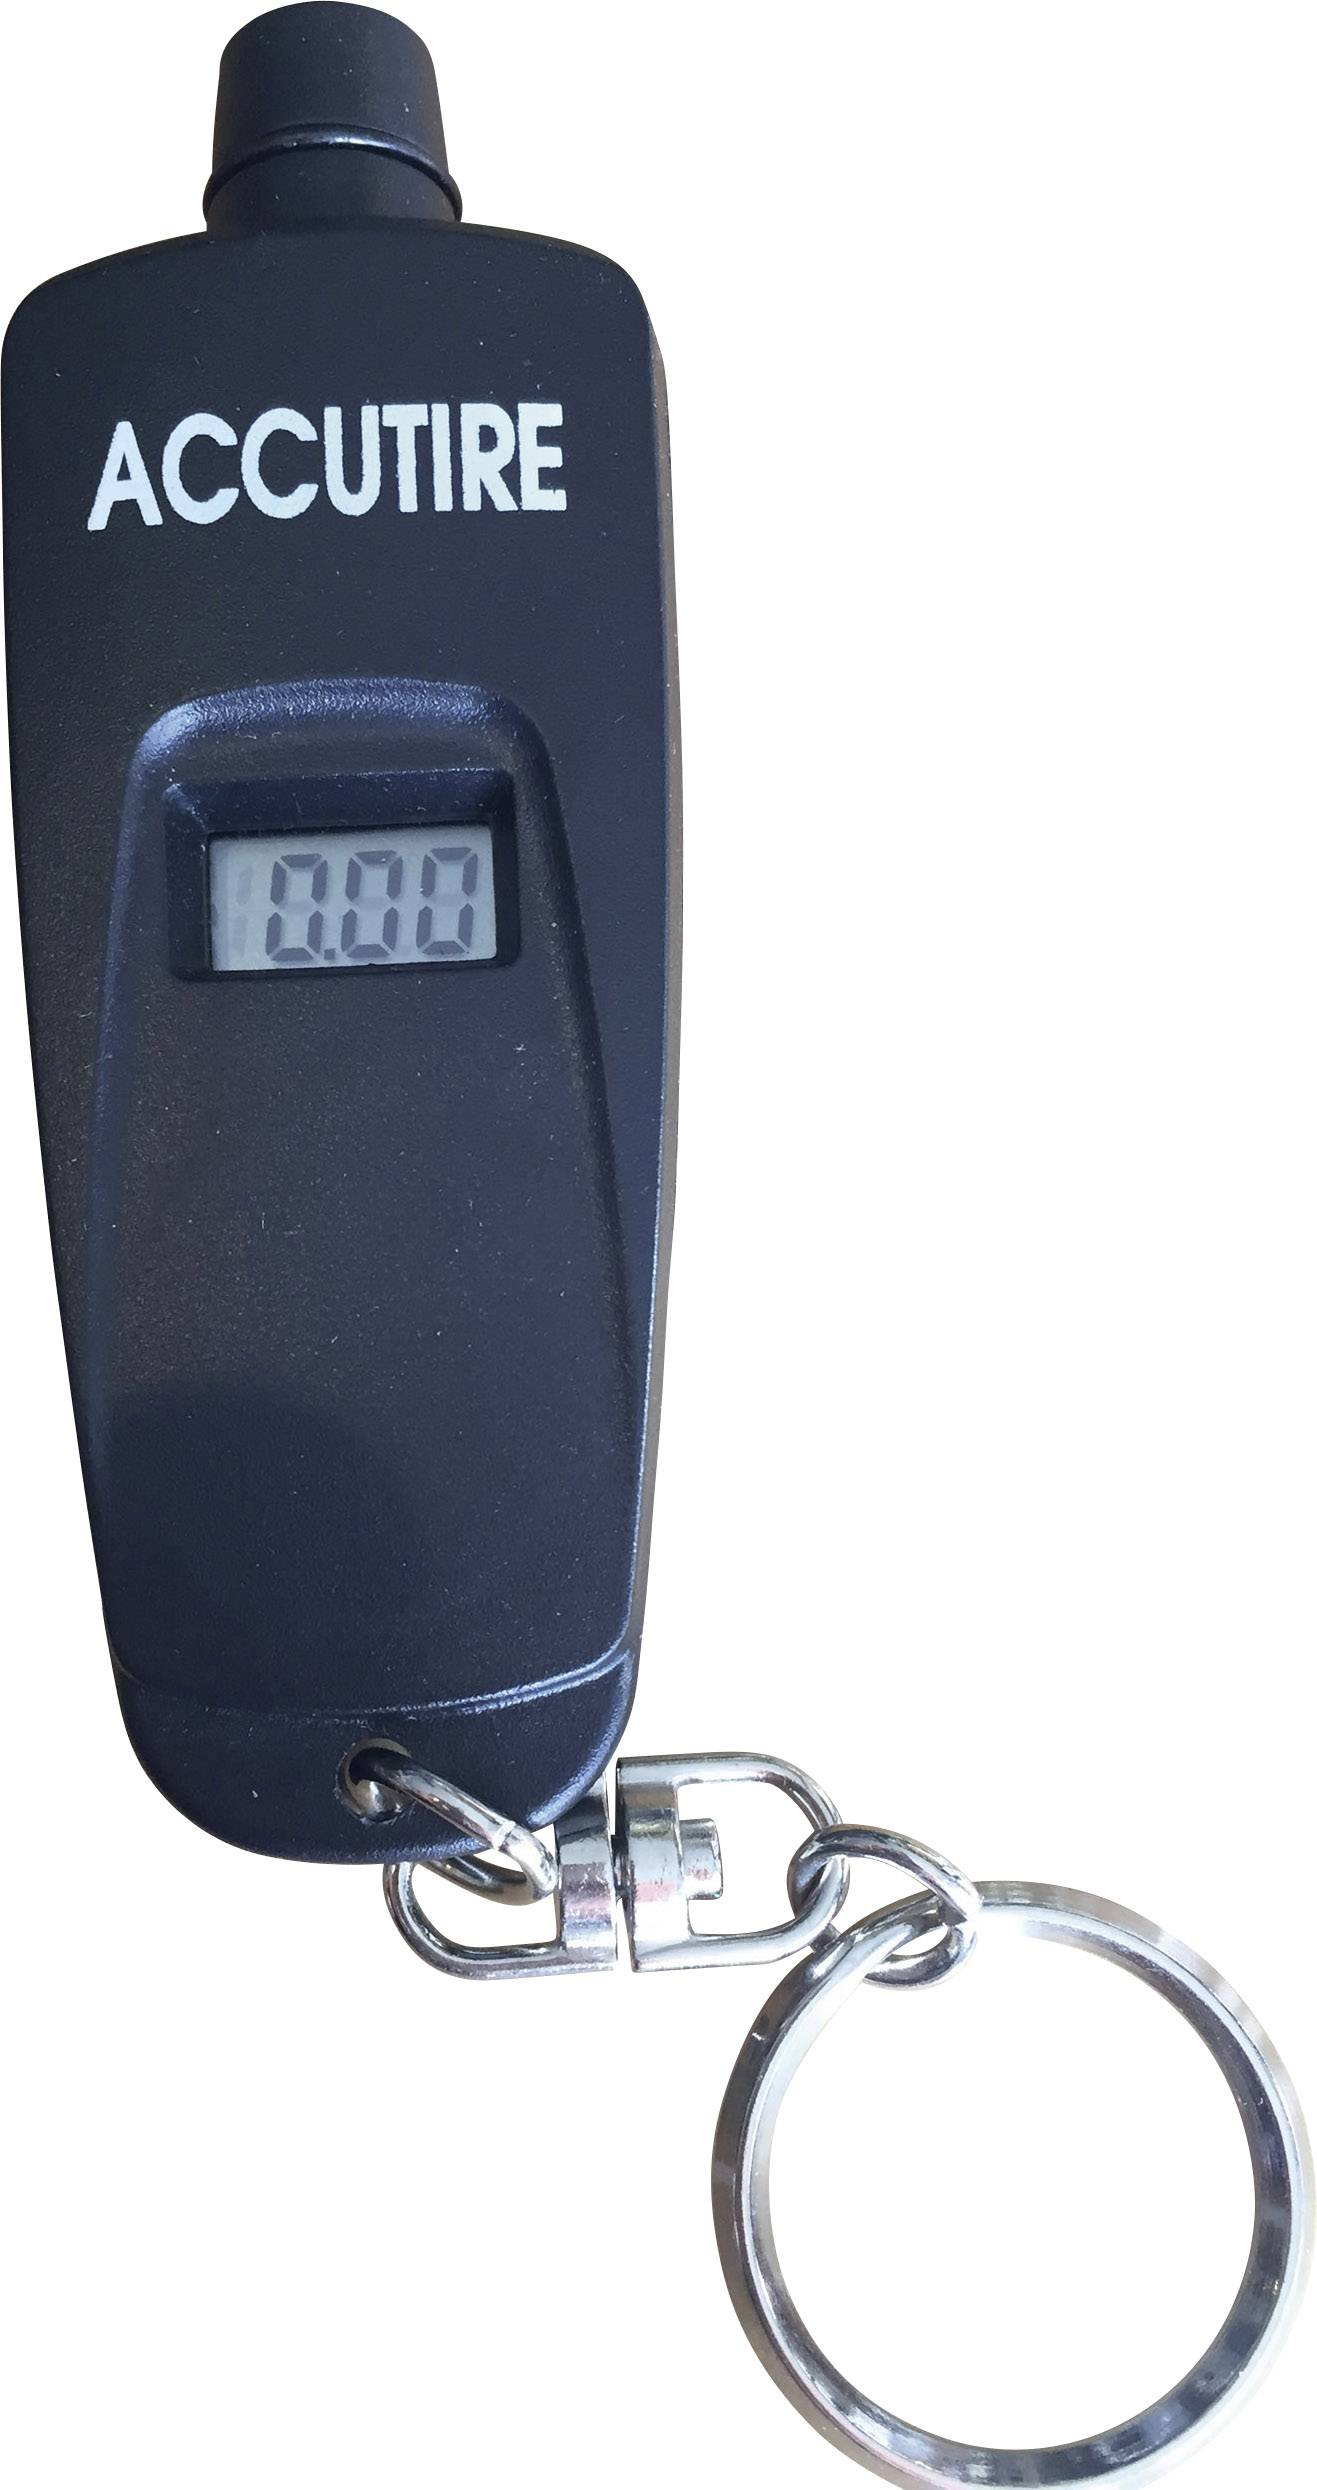 Digitální měřič tlaku pneumatik Accutire, 0,4 - 6,8 bar